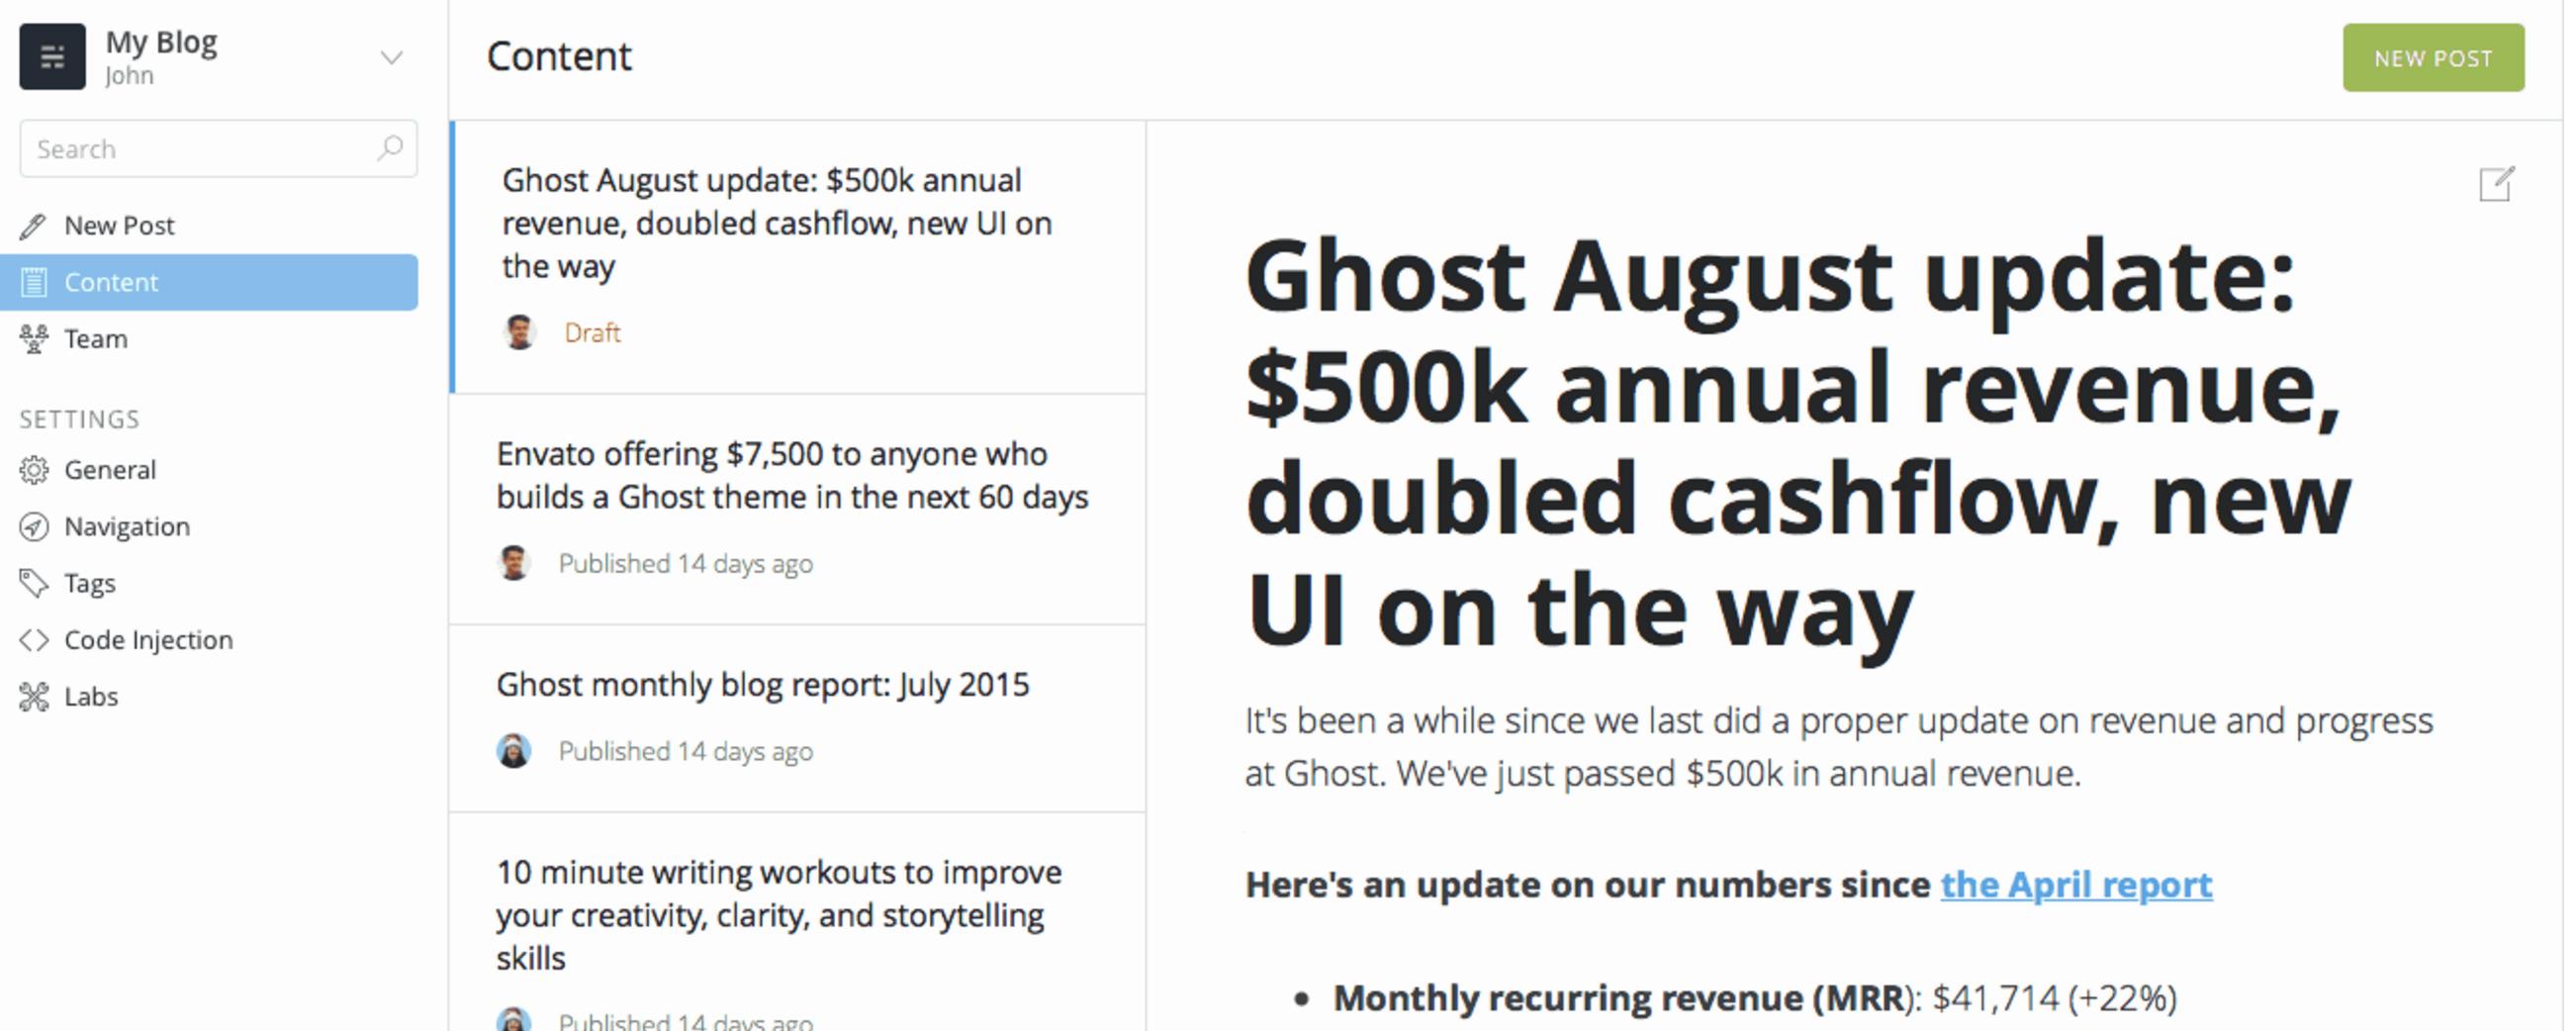 Ghost's blog platform finally got a big design upgrade